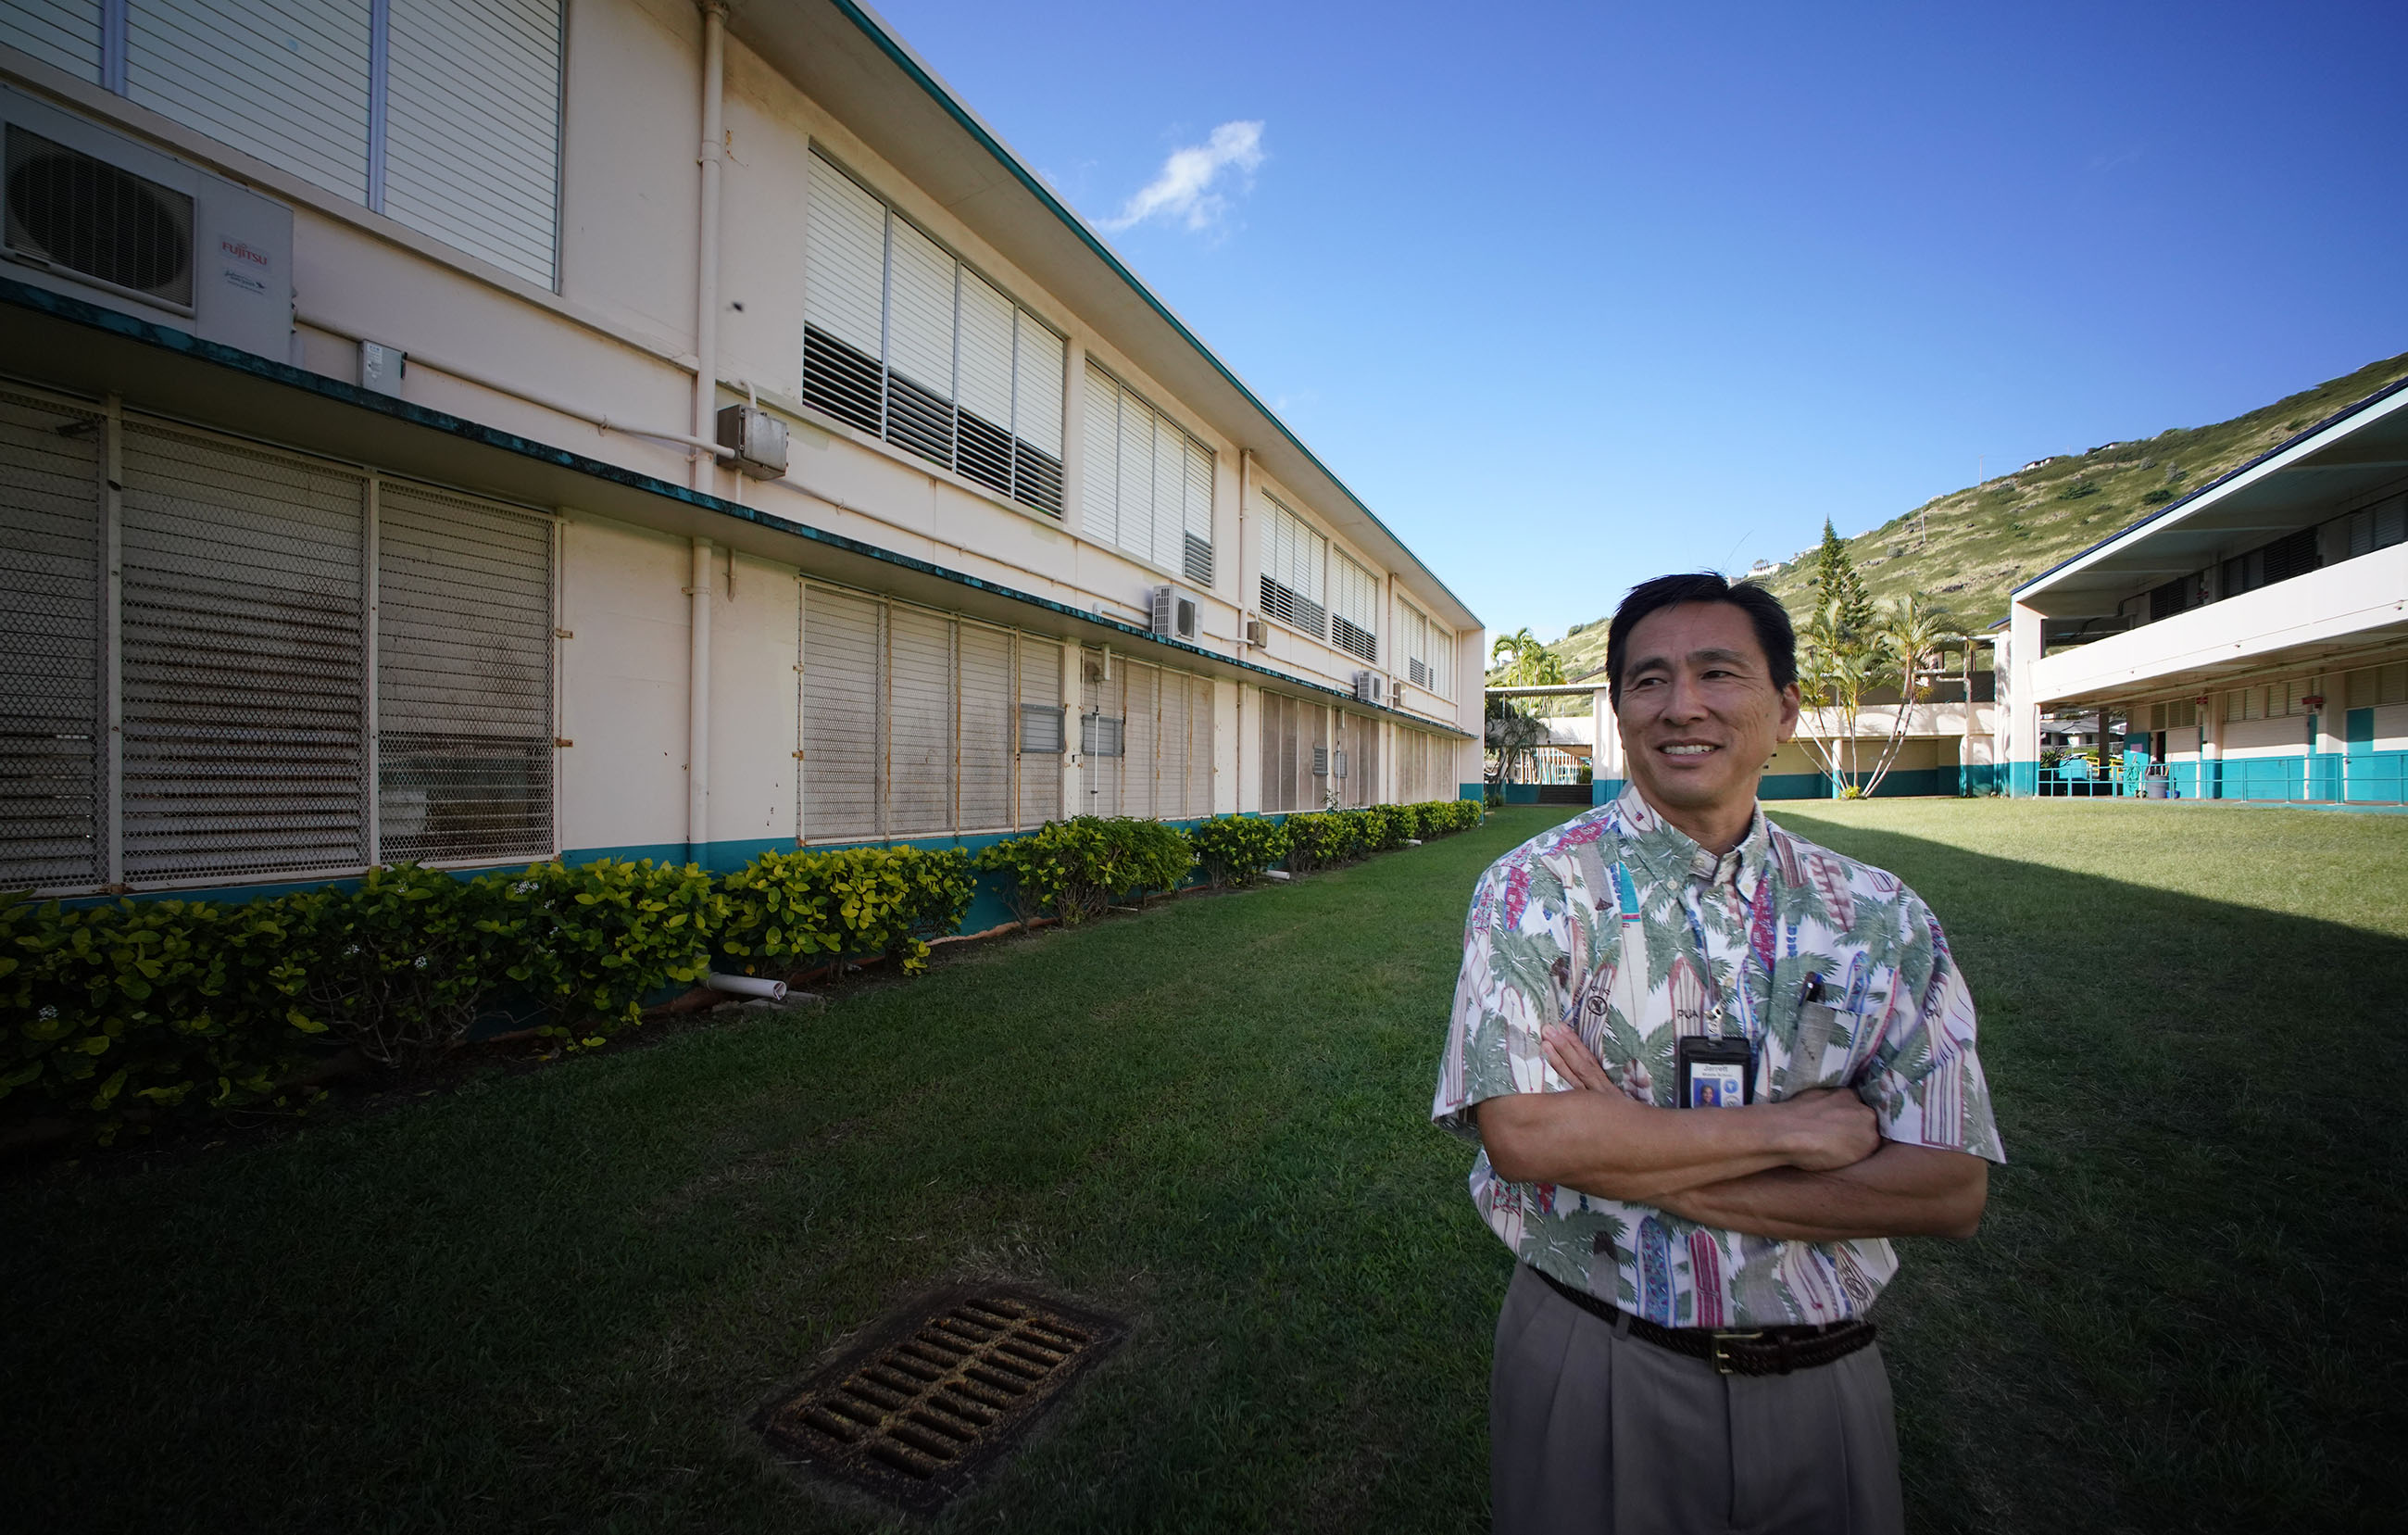 Jarrett Middle School Principal Reid Kuba.